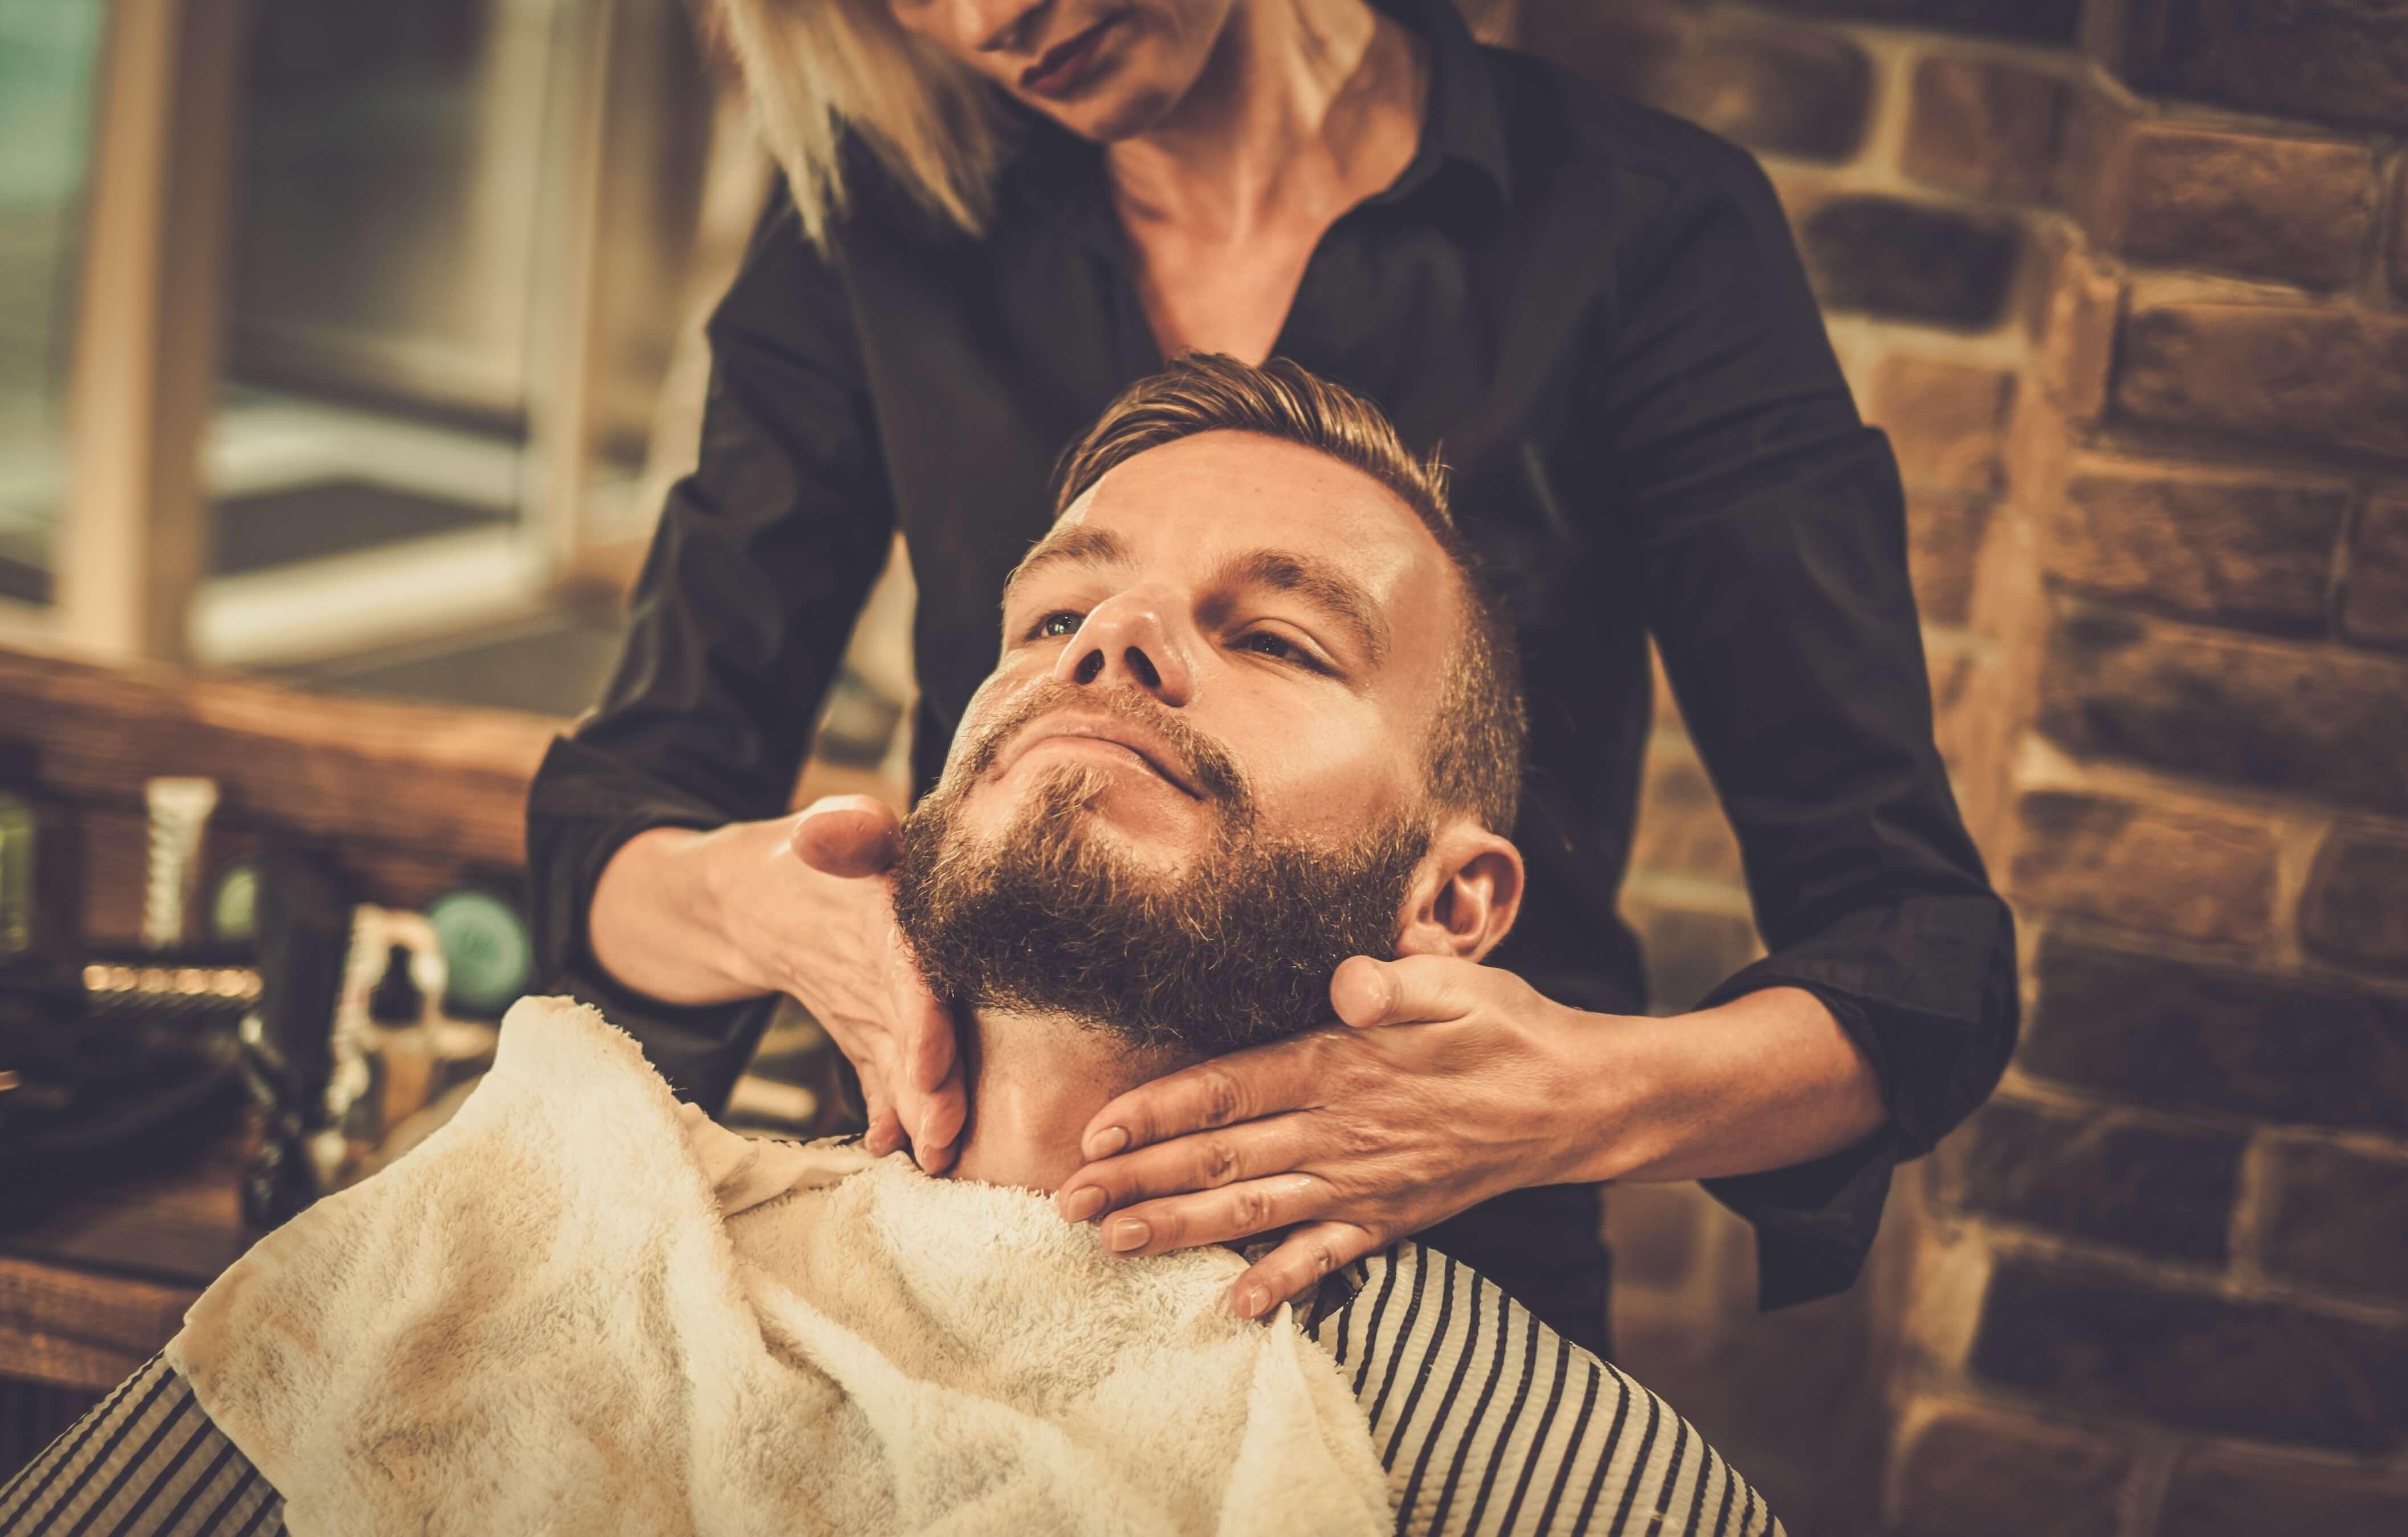 A man getting his beard groomedby a woman.